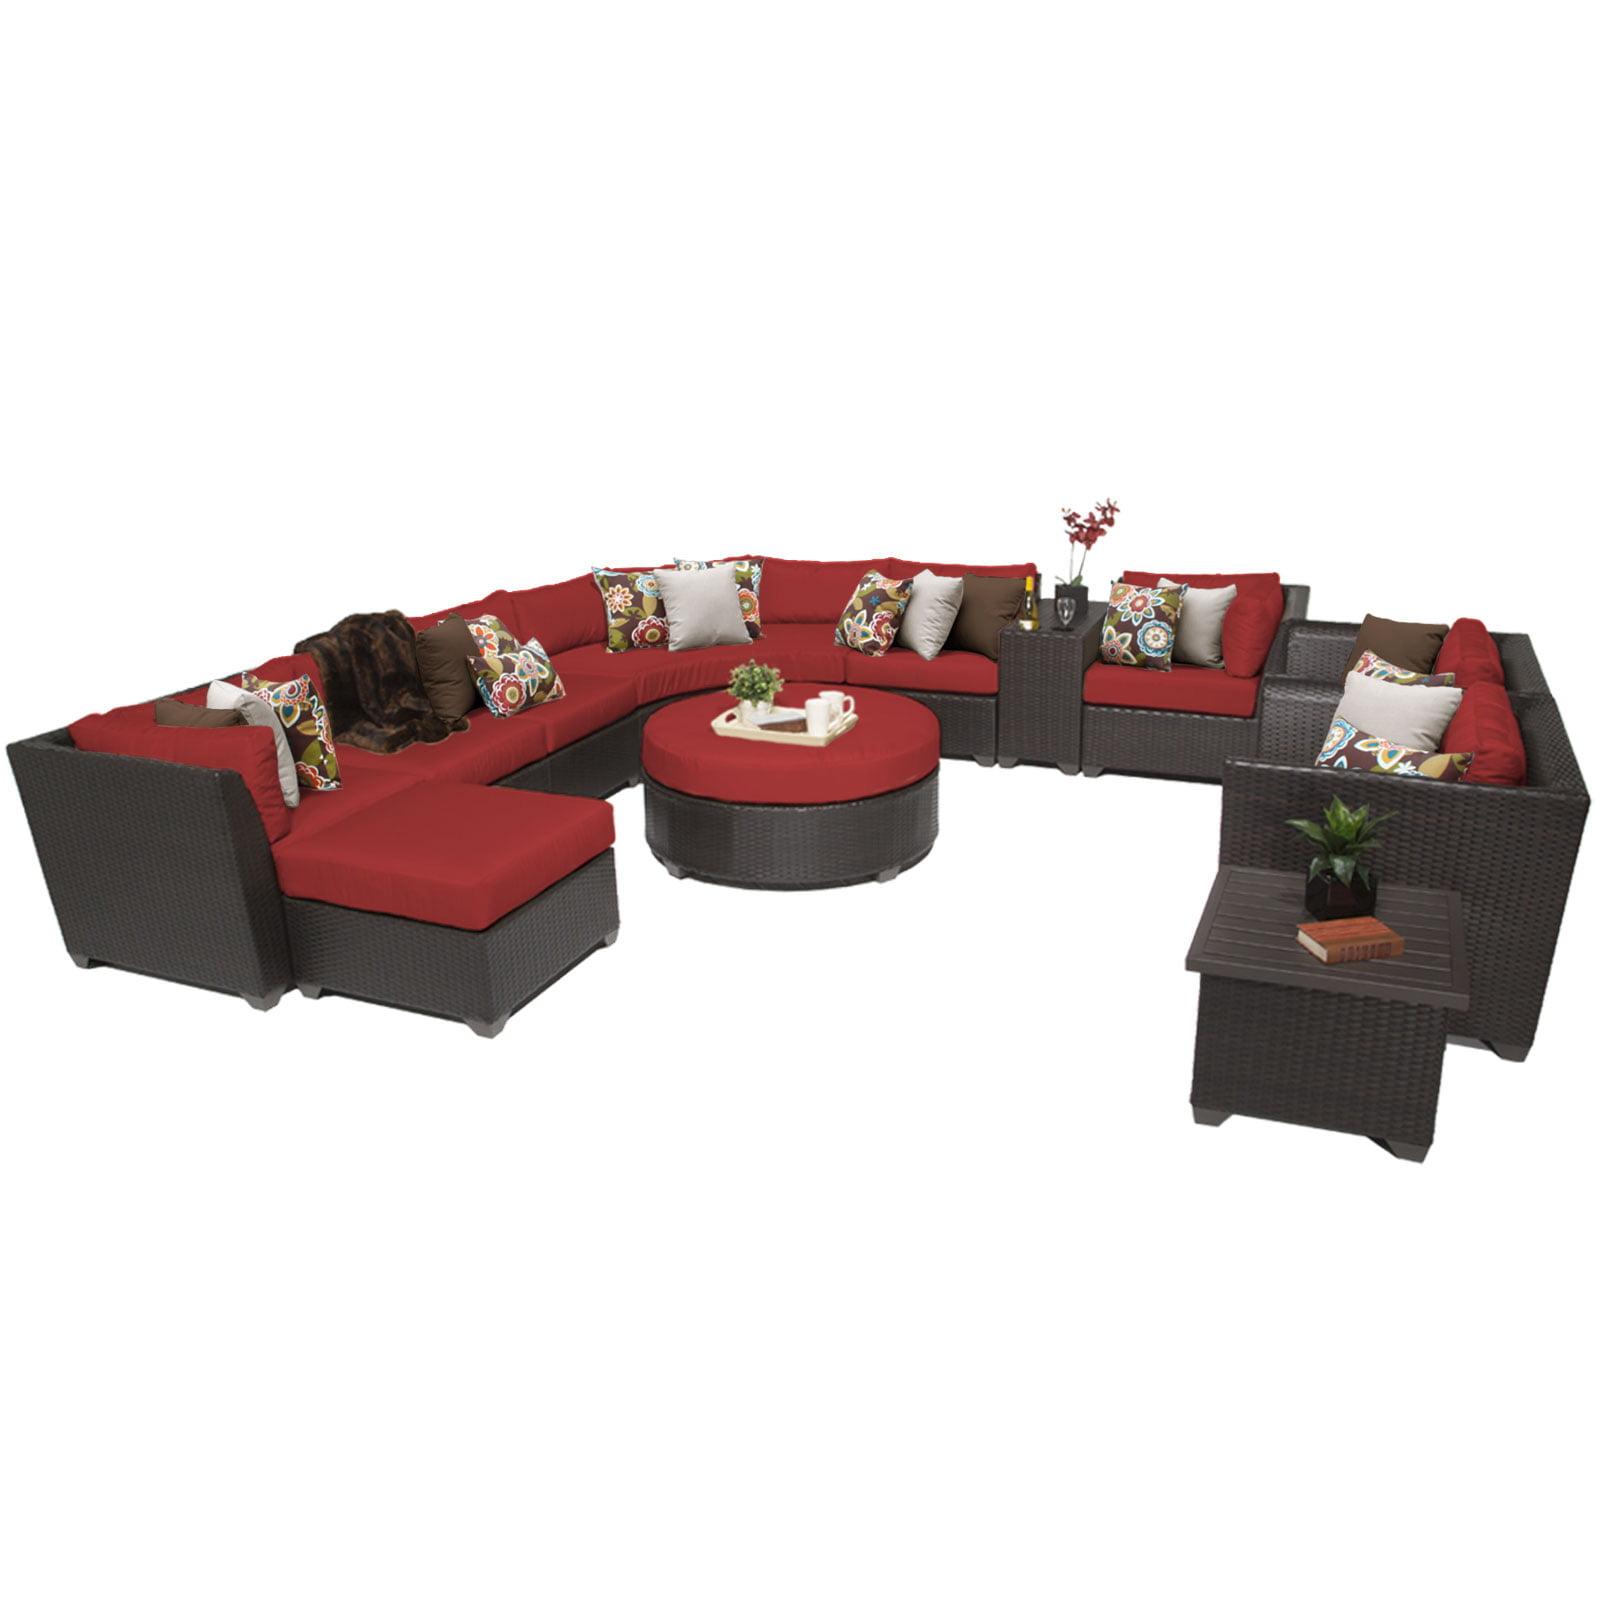 Bermuda 12 Piece Outdoor Wicker Patio Furniture Set 12a by TK Classics